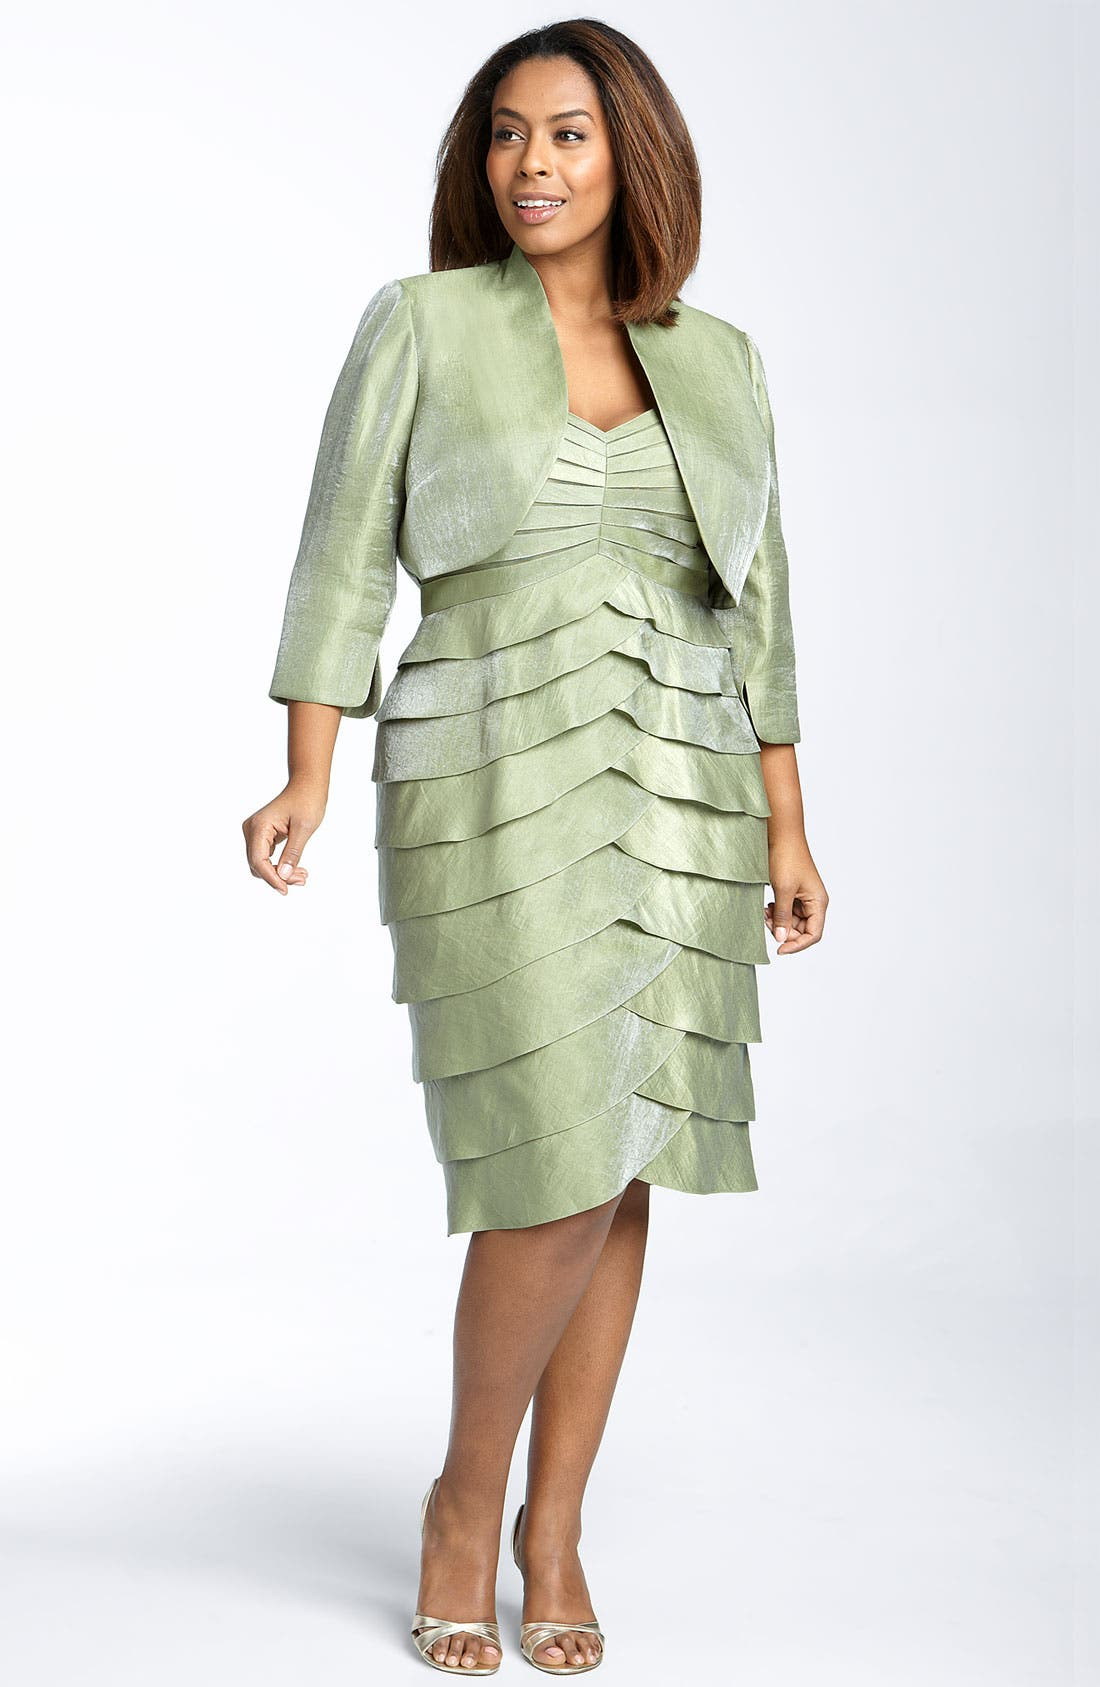 Main Image - Adrianna Papell Evening Shutter Pleat Dress with Bolero Jacket (Plus)